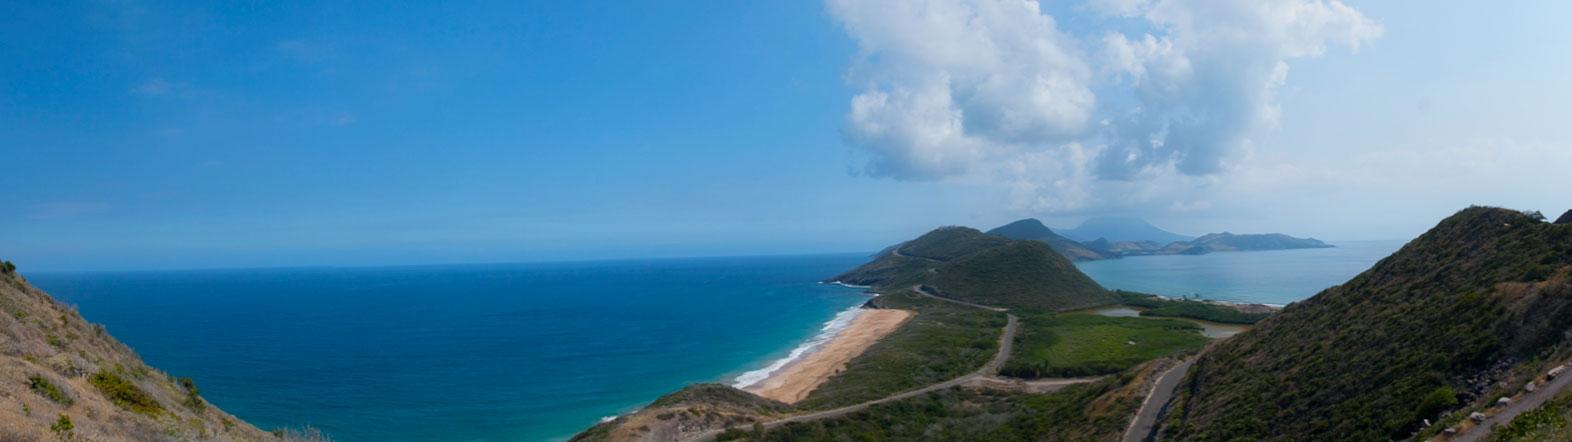 File:Saint Kitts and Nevis panorama.jpg - Wikimedia Commons